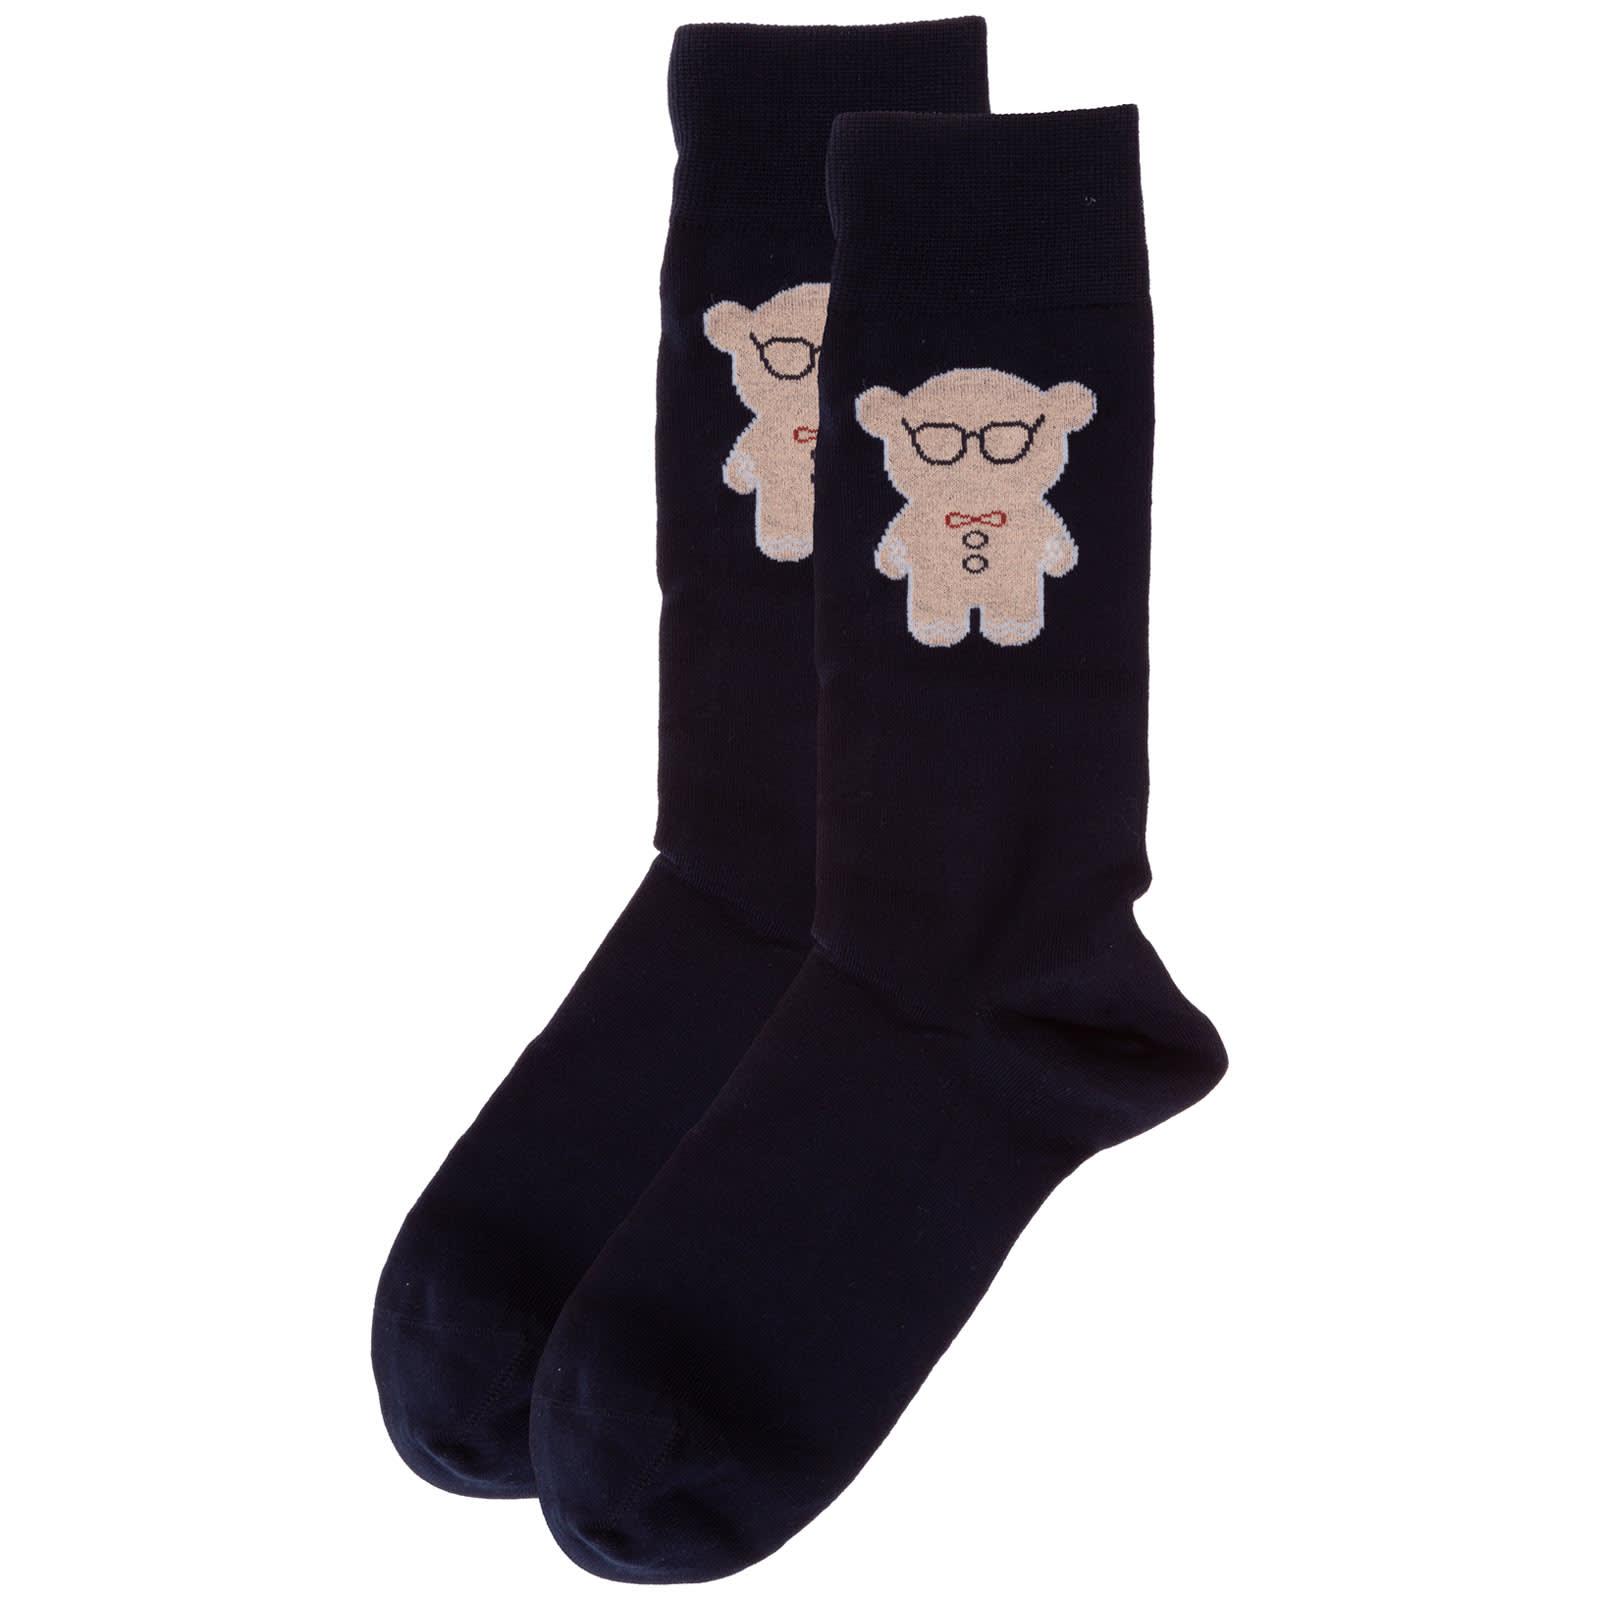 Emporio Armani Trifolio Low Socks